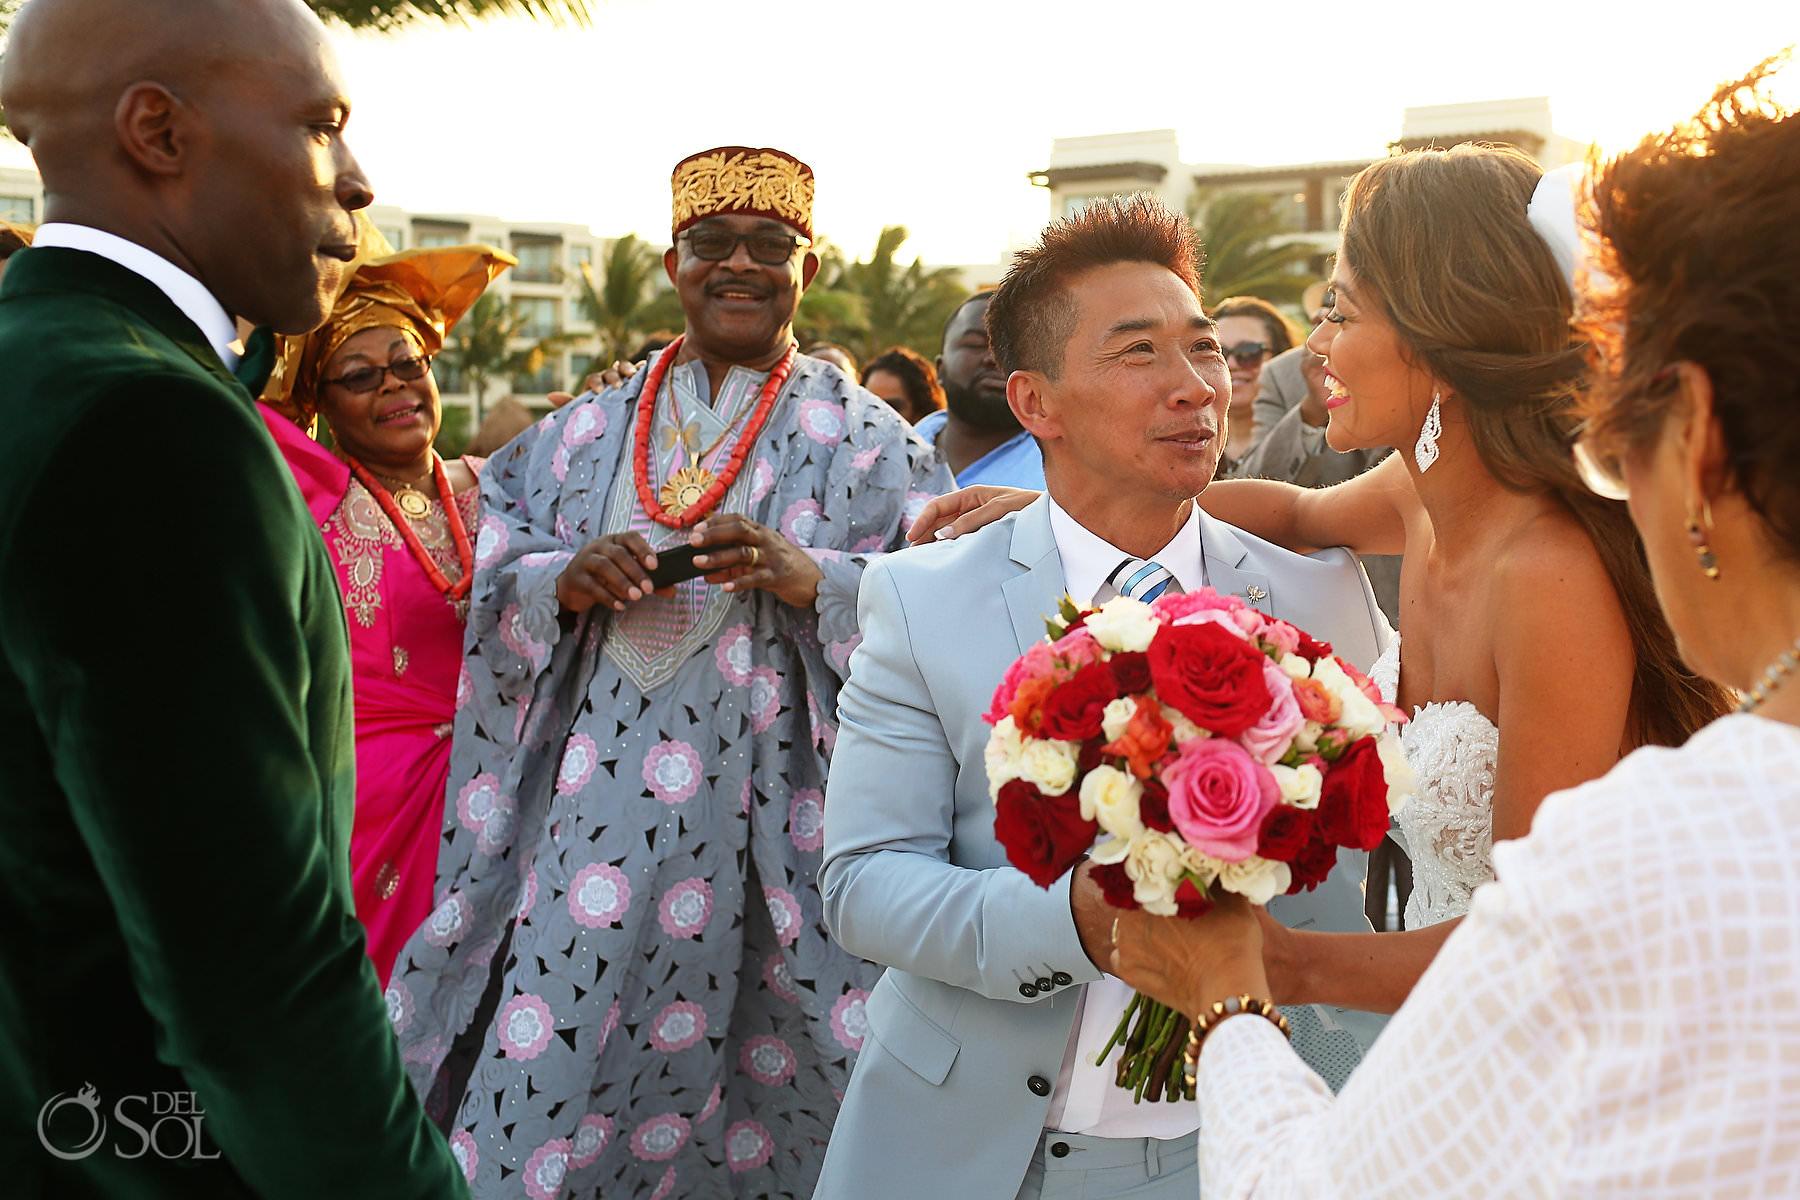 Multicultural wedding Dreams Riviera Cancun Mexico